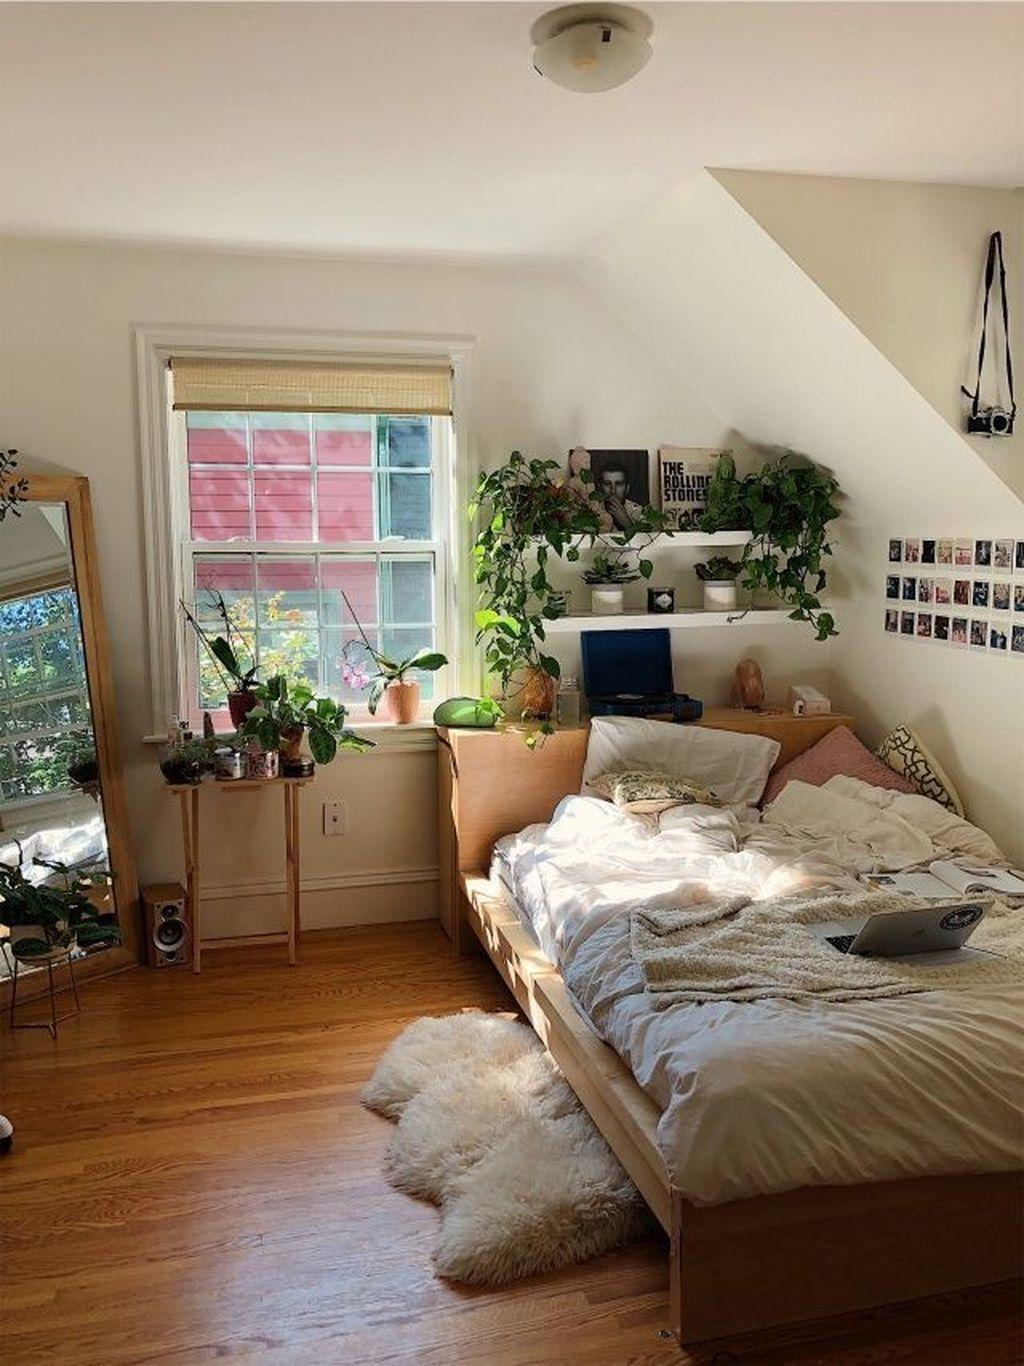 31 Lovely Cozy Bedroom Ideas Make You Feel Relax Room Inspiration Bedroom Room Ideas Bedroom Aesthetic Room Decor Cozy apartment bedroom ideas